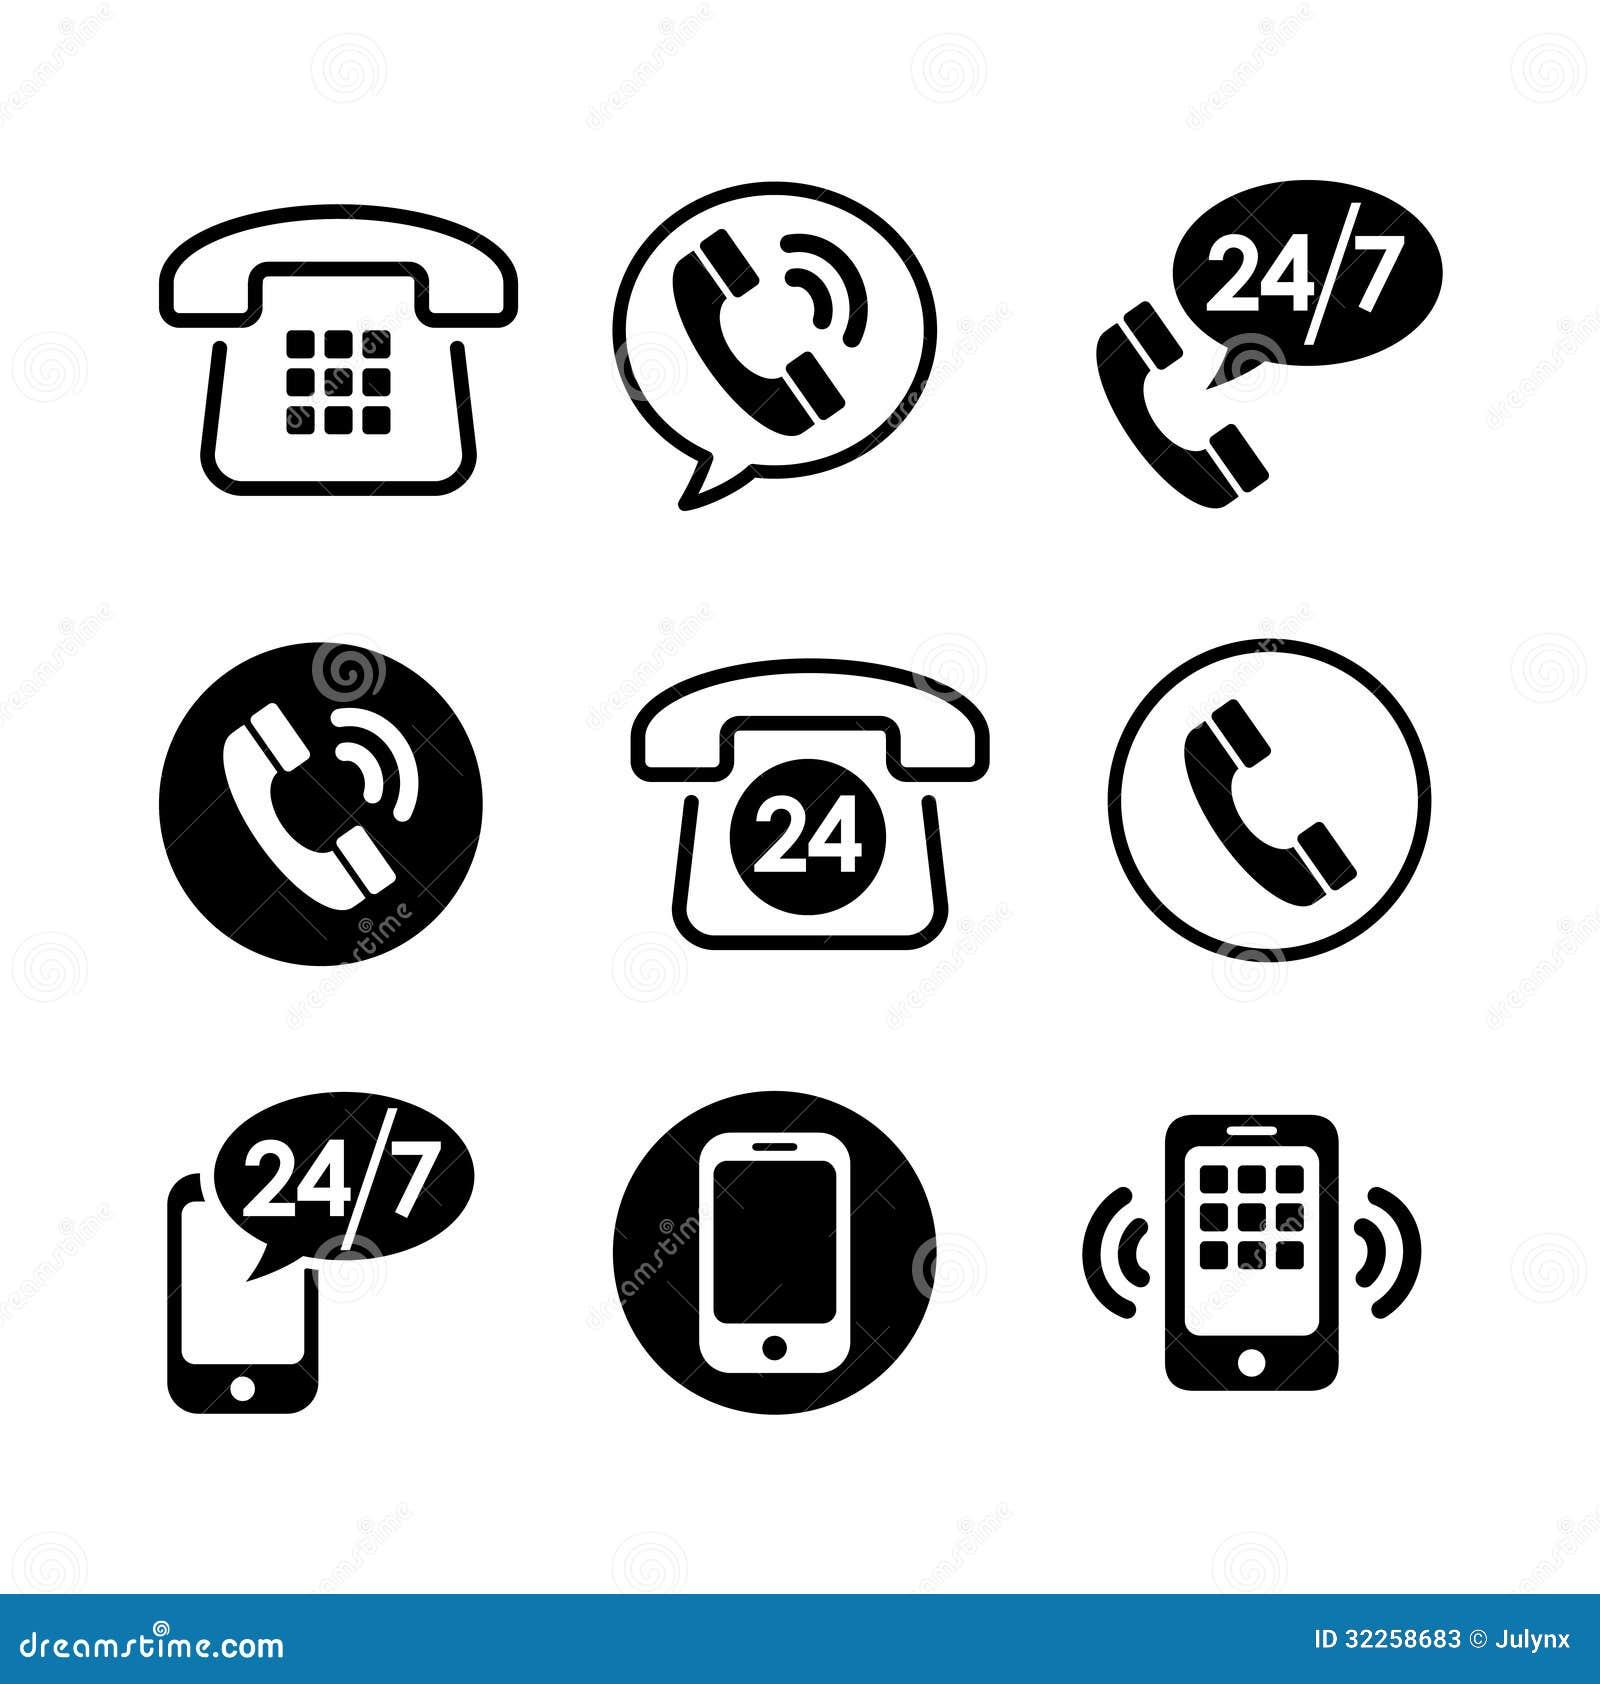 9 icon set - communication stock photos